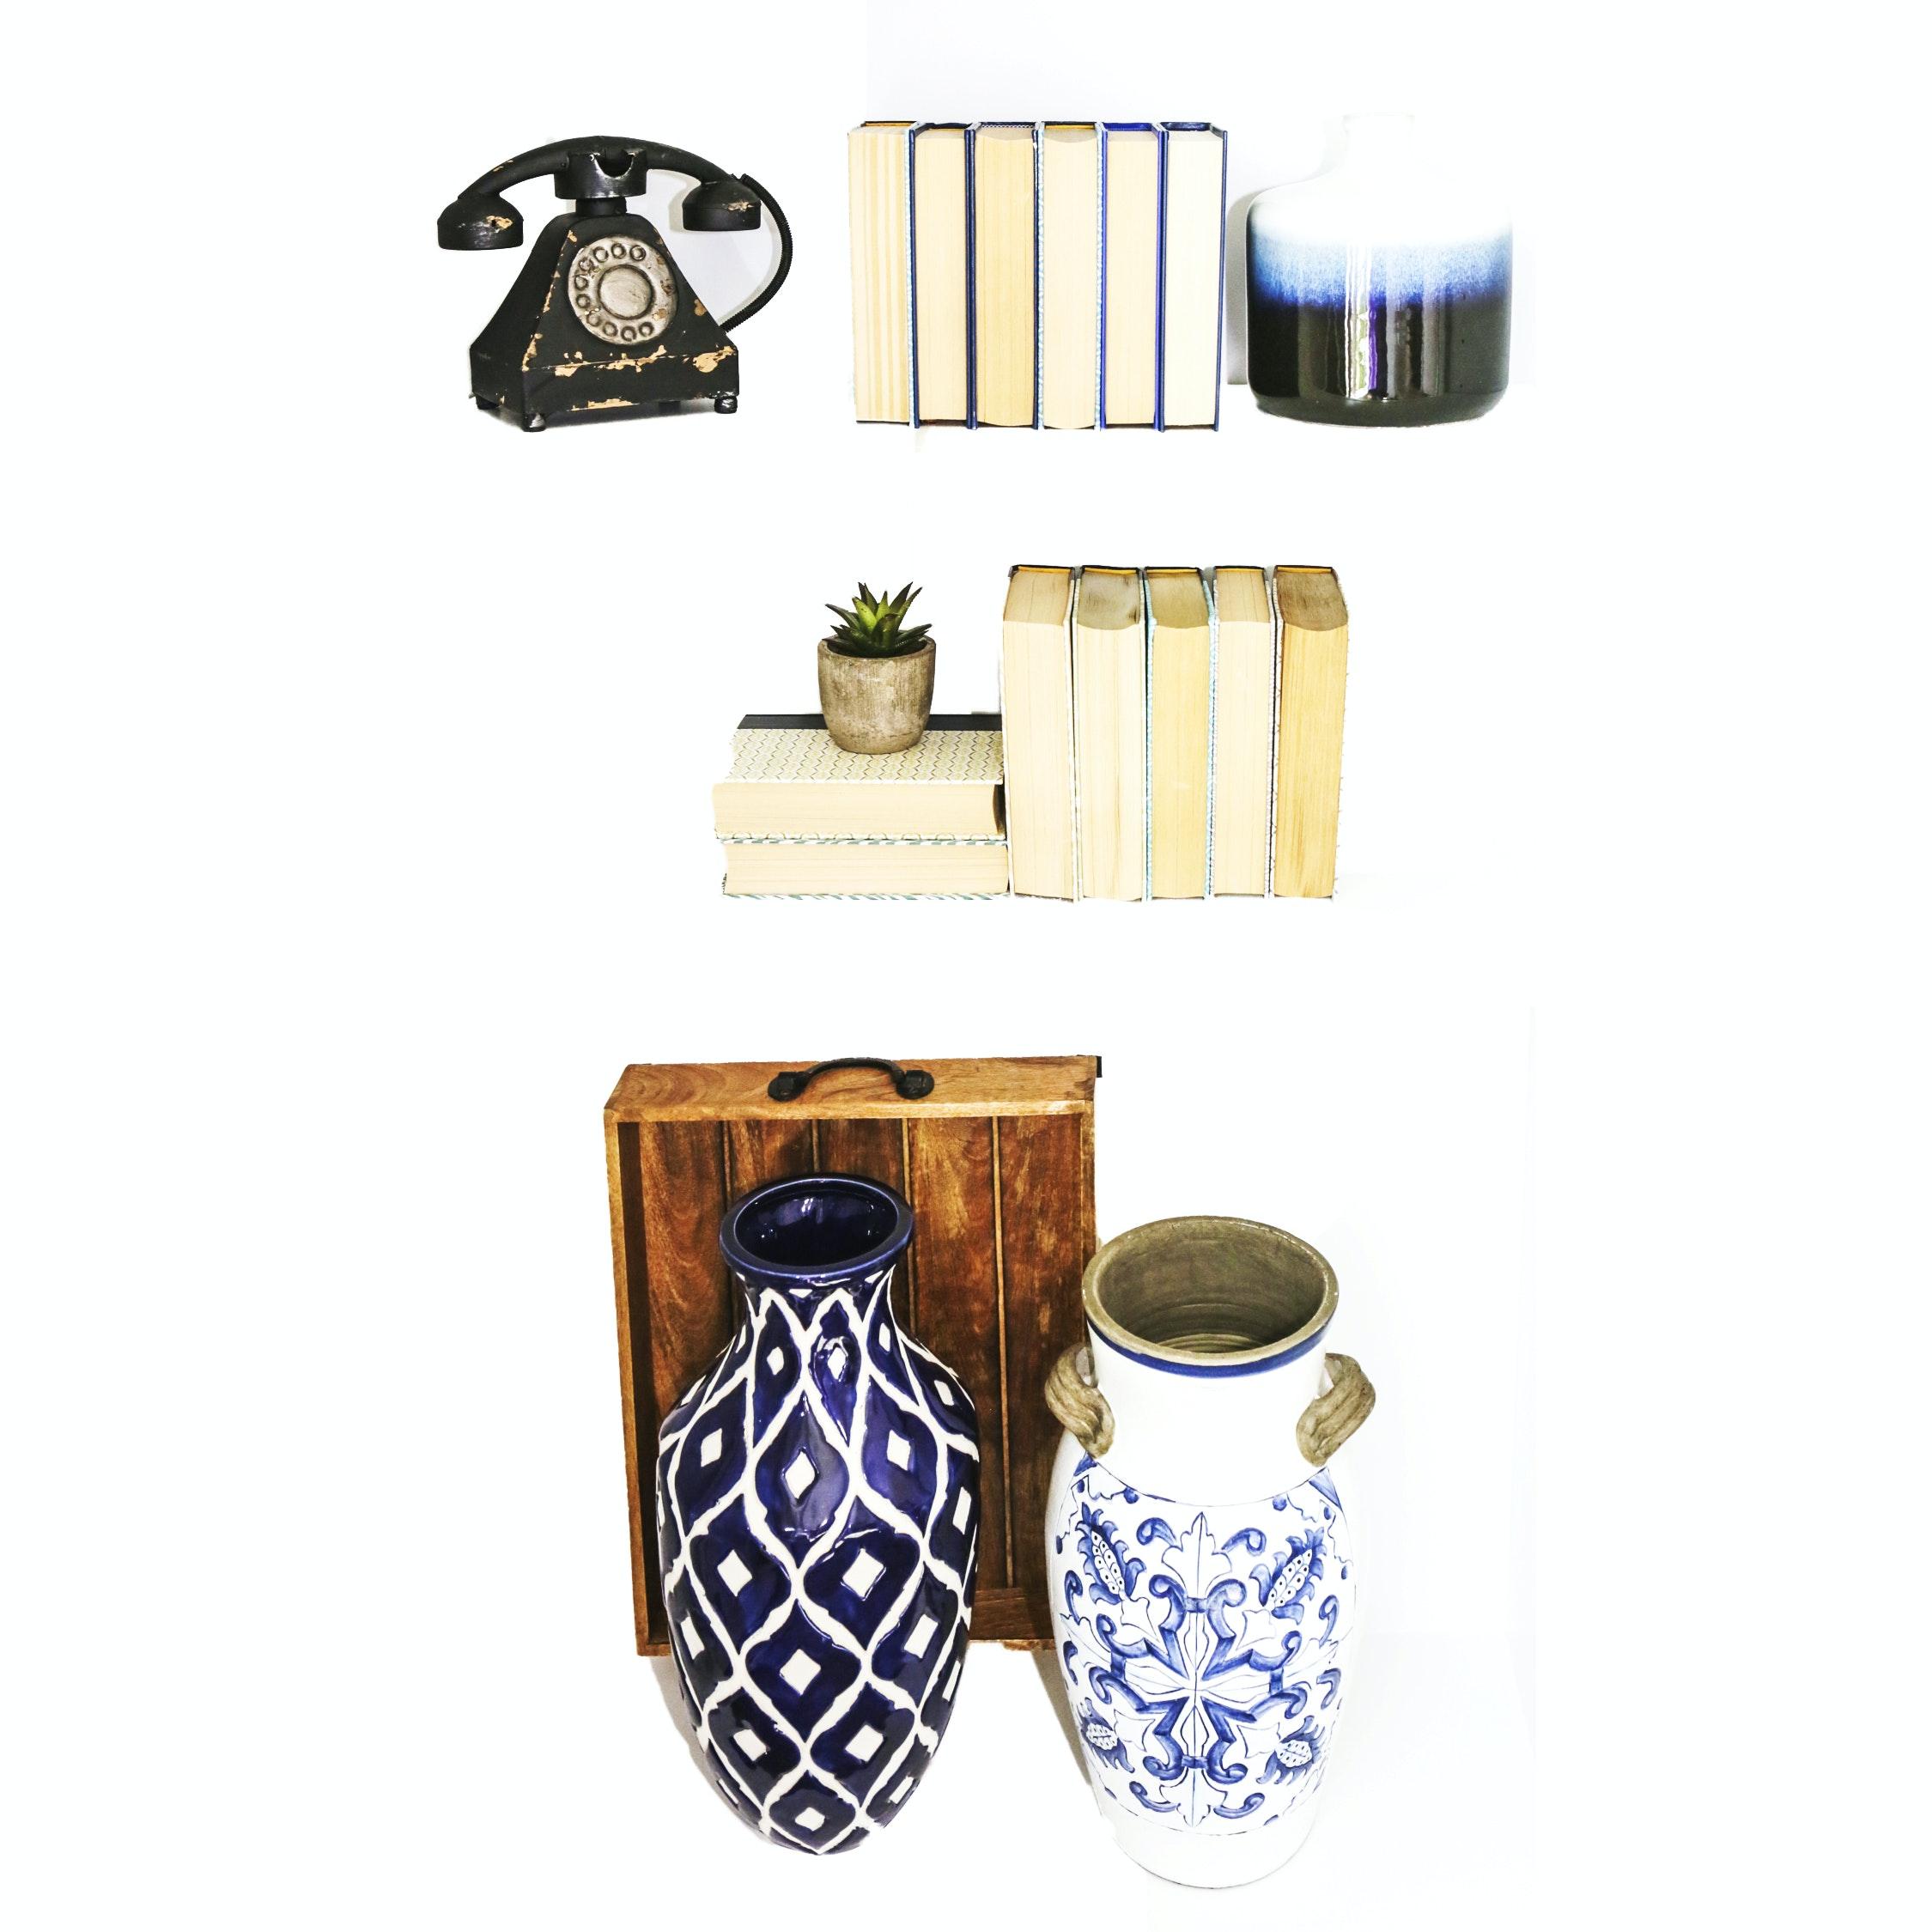 Ceramic Vases, Decorative Books, and Other Decor